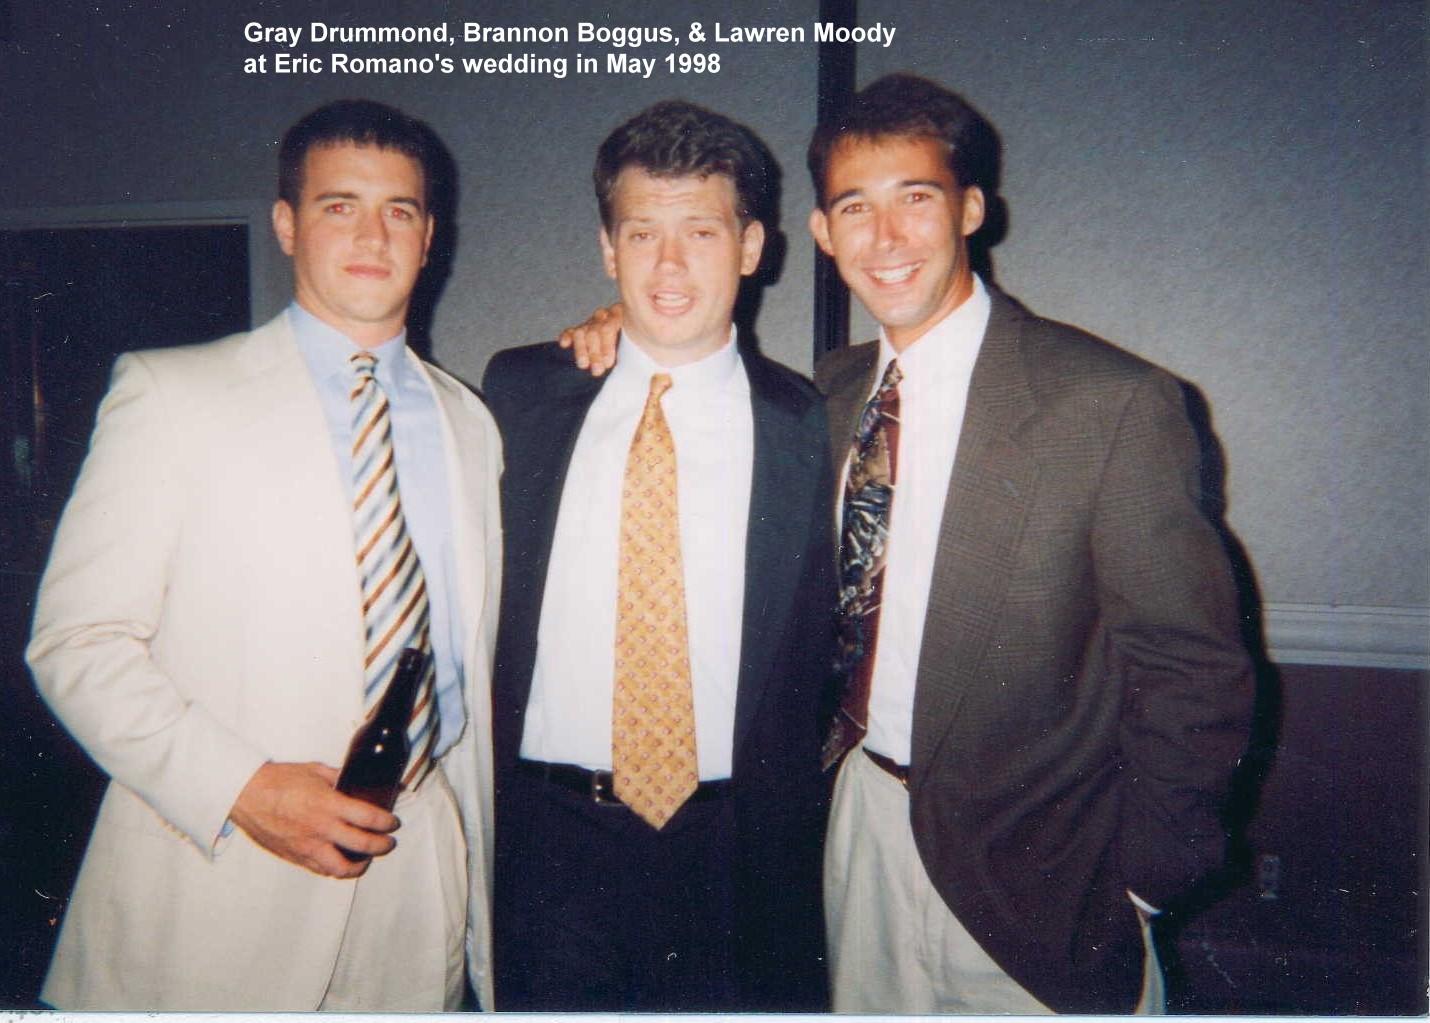 1998 Romano wedding Drummond Boggus _ Moody.jpg